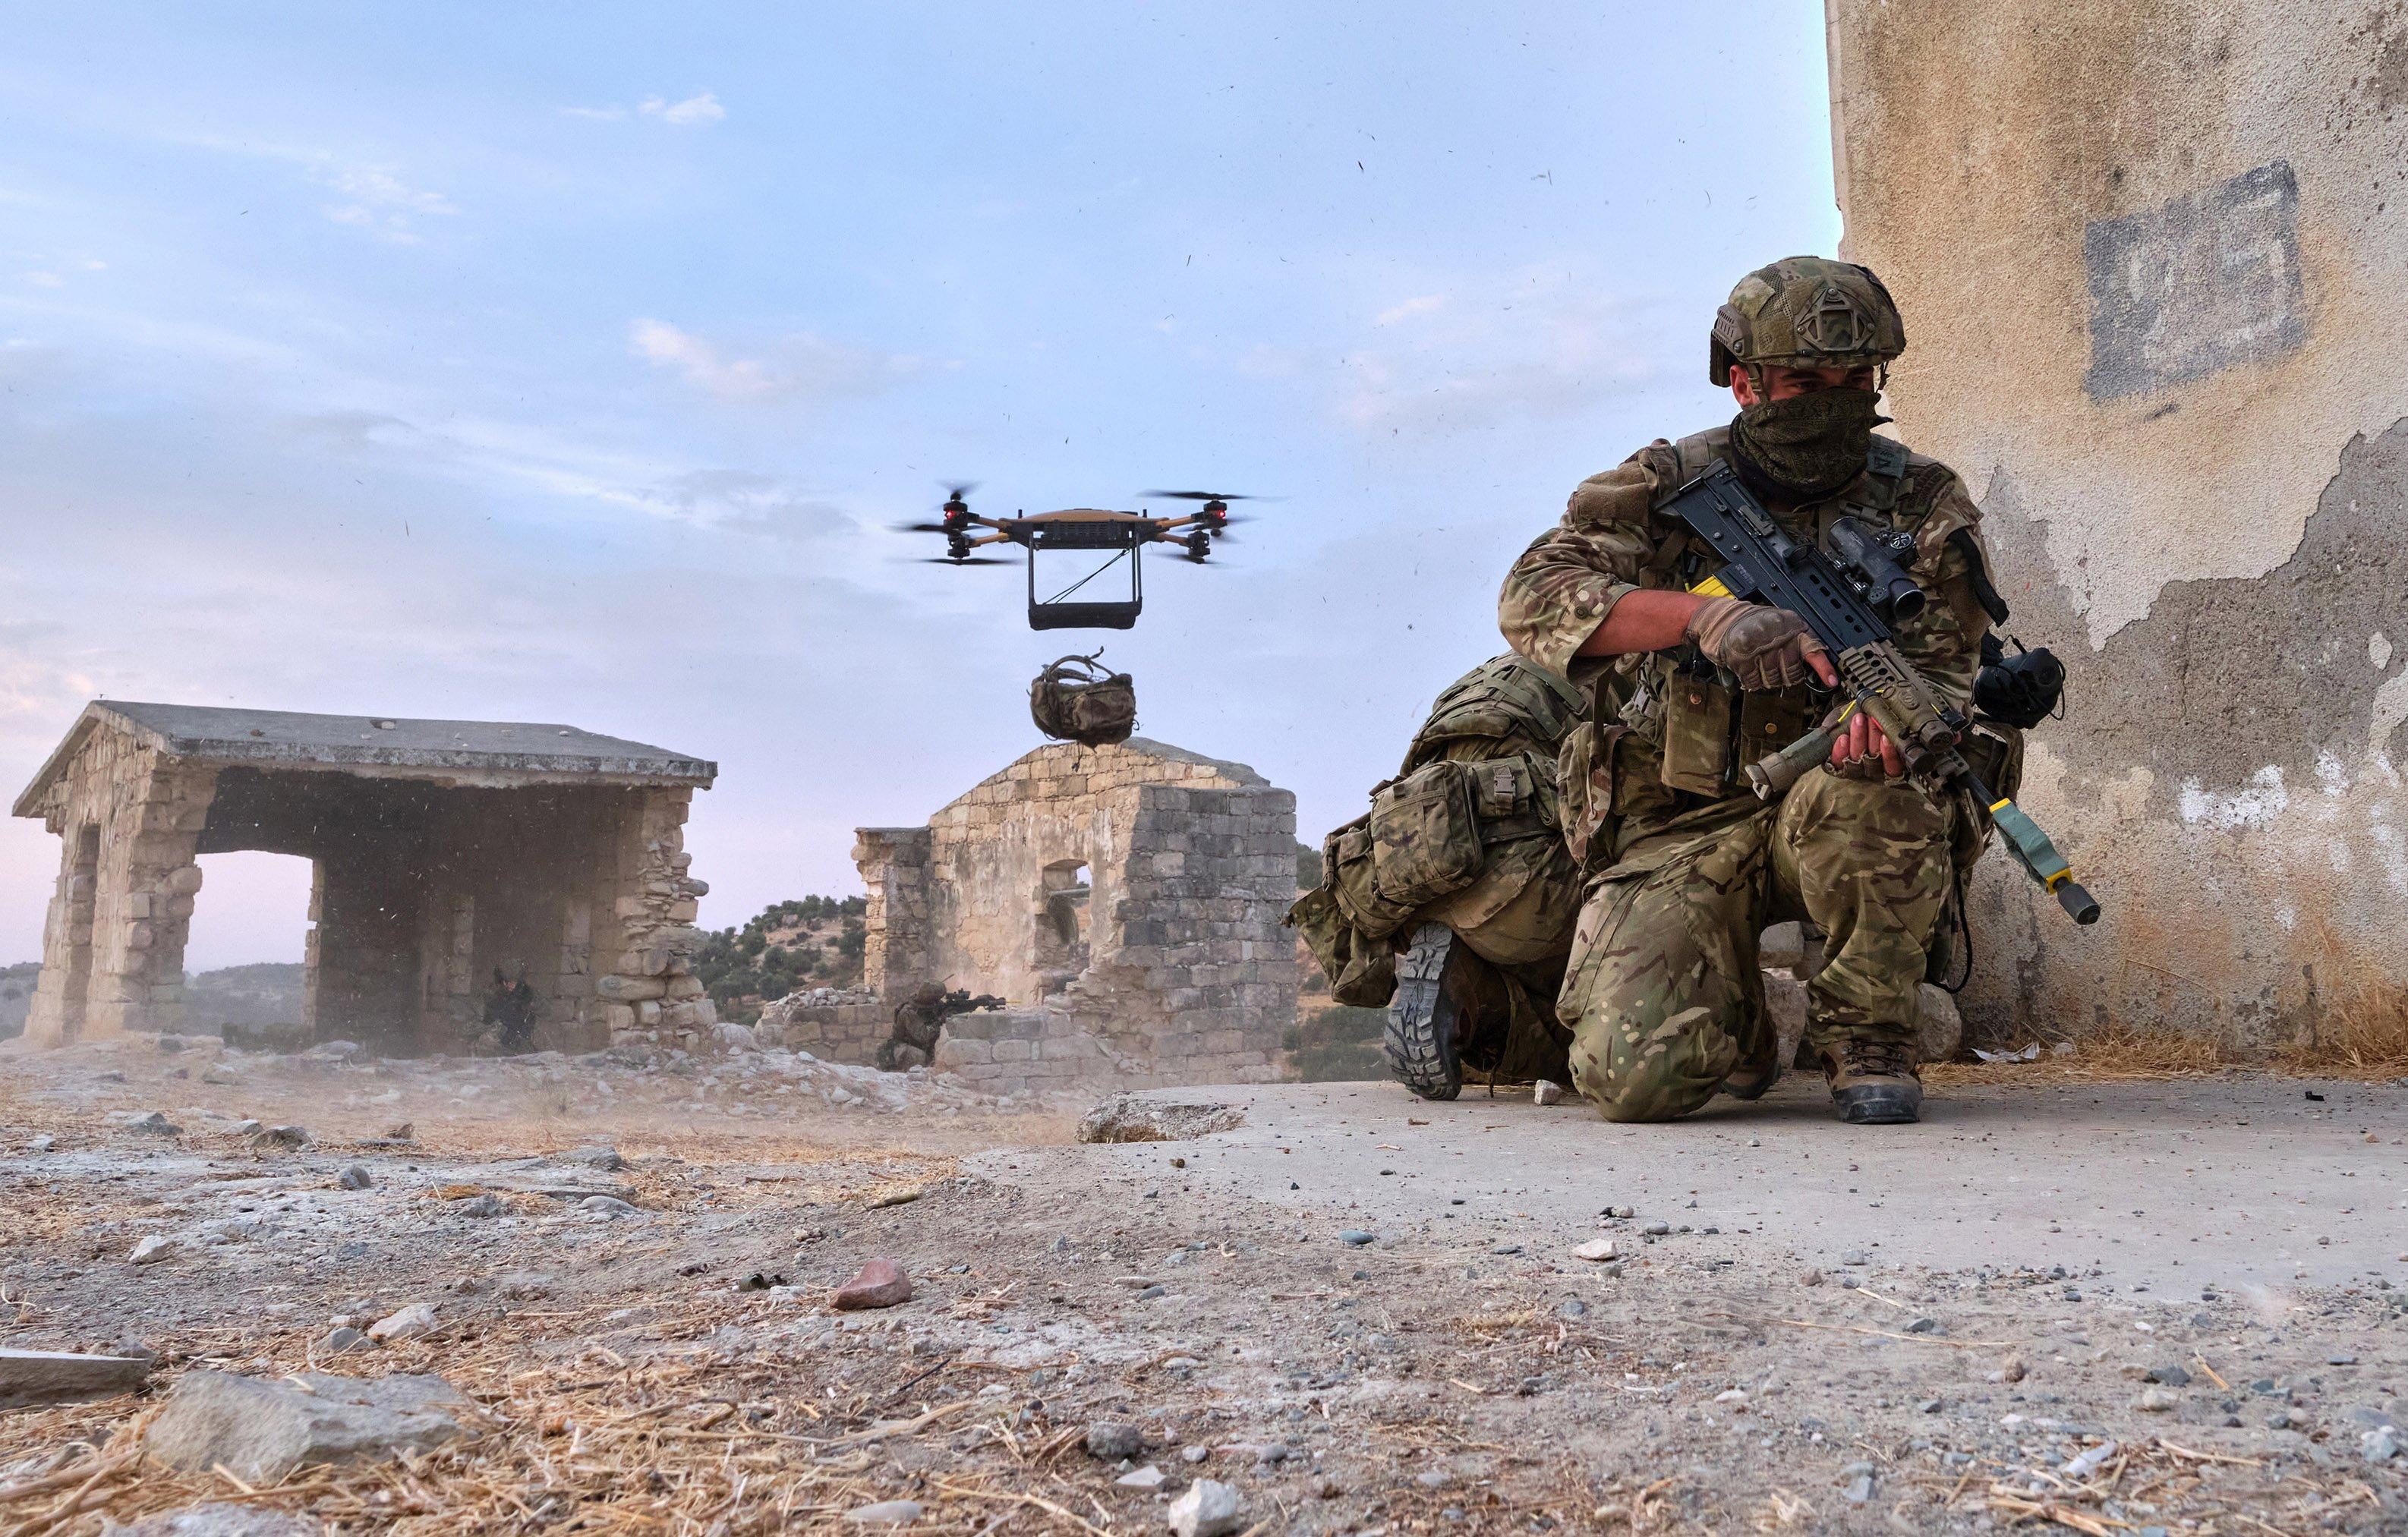 Malloy Aeronautics heavy lift drone bergan drop [MoD Crown Copyright/Petty Officer Photographer Si Ethell]